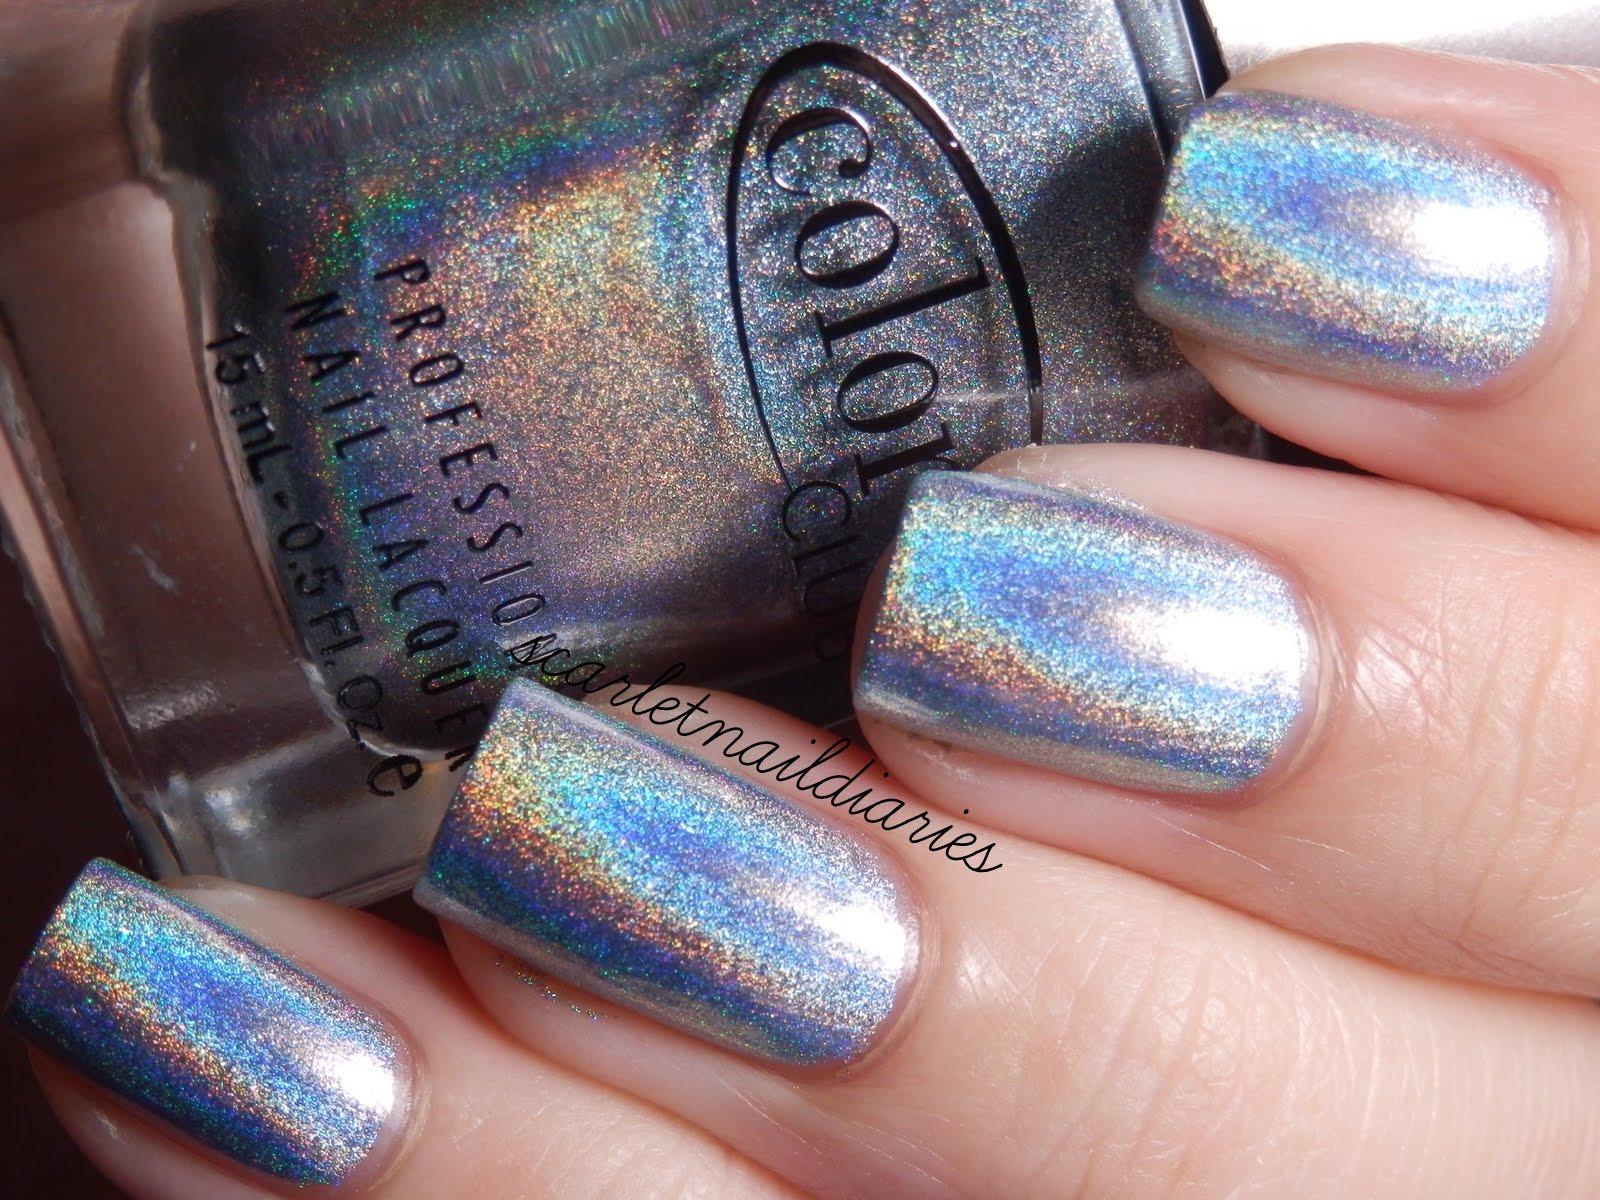 Color Club Blue Heaven Halo Hues Light Holographic Holo Nail Polish 979 On The Hunt